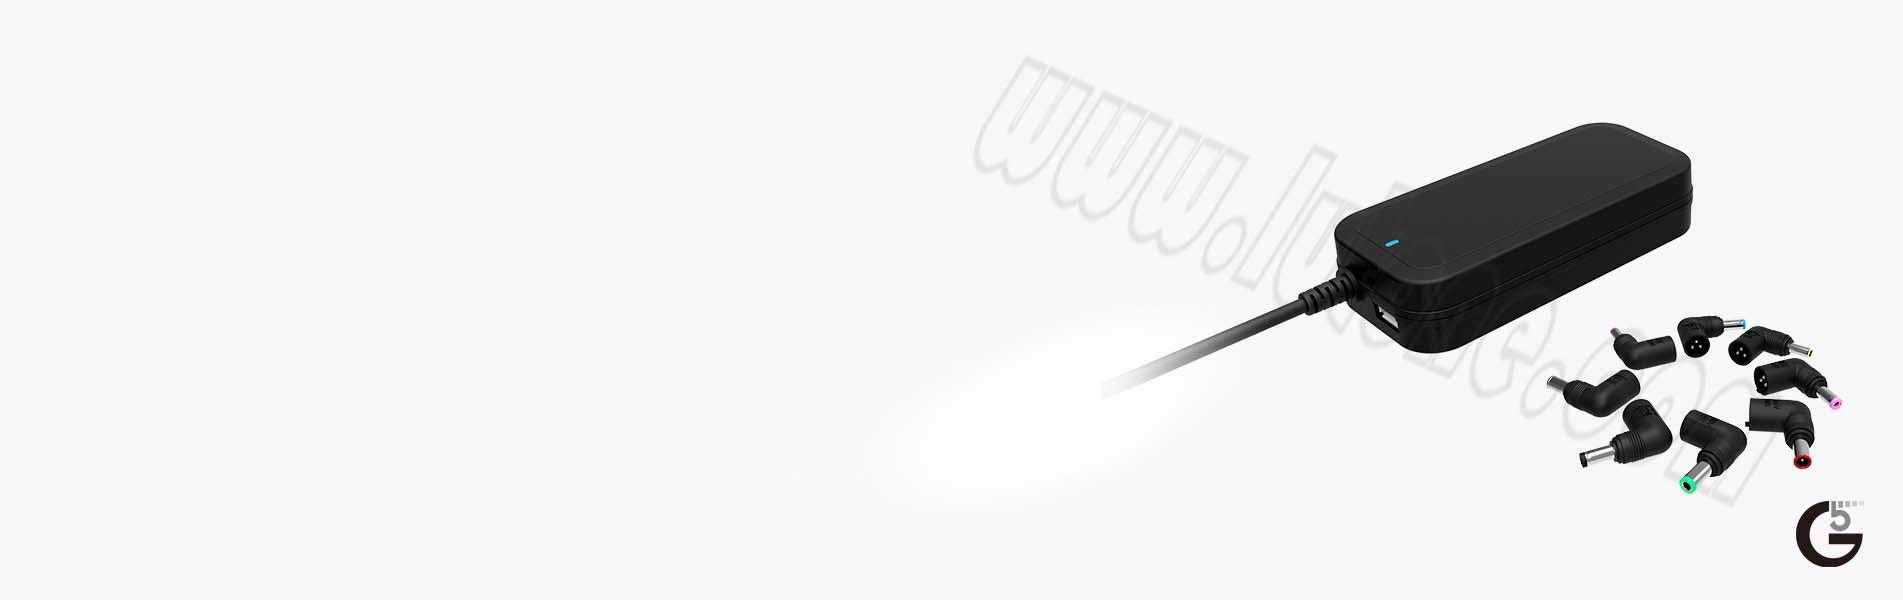 universal manual laptop ac adapter